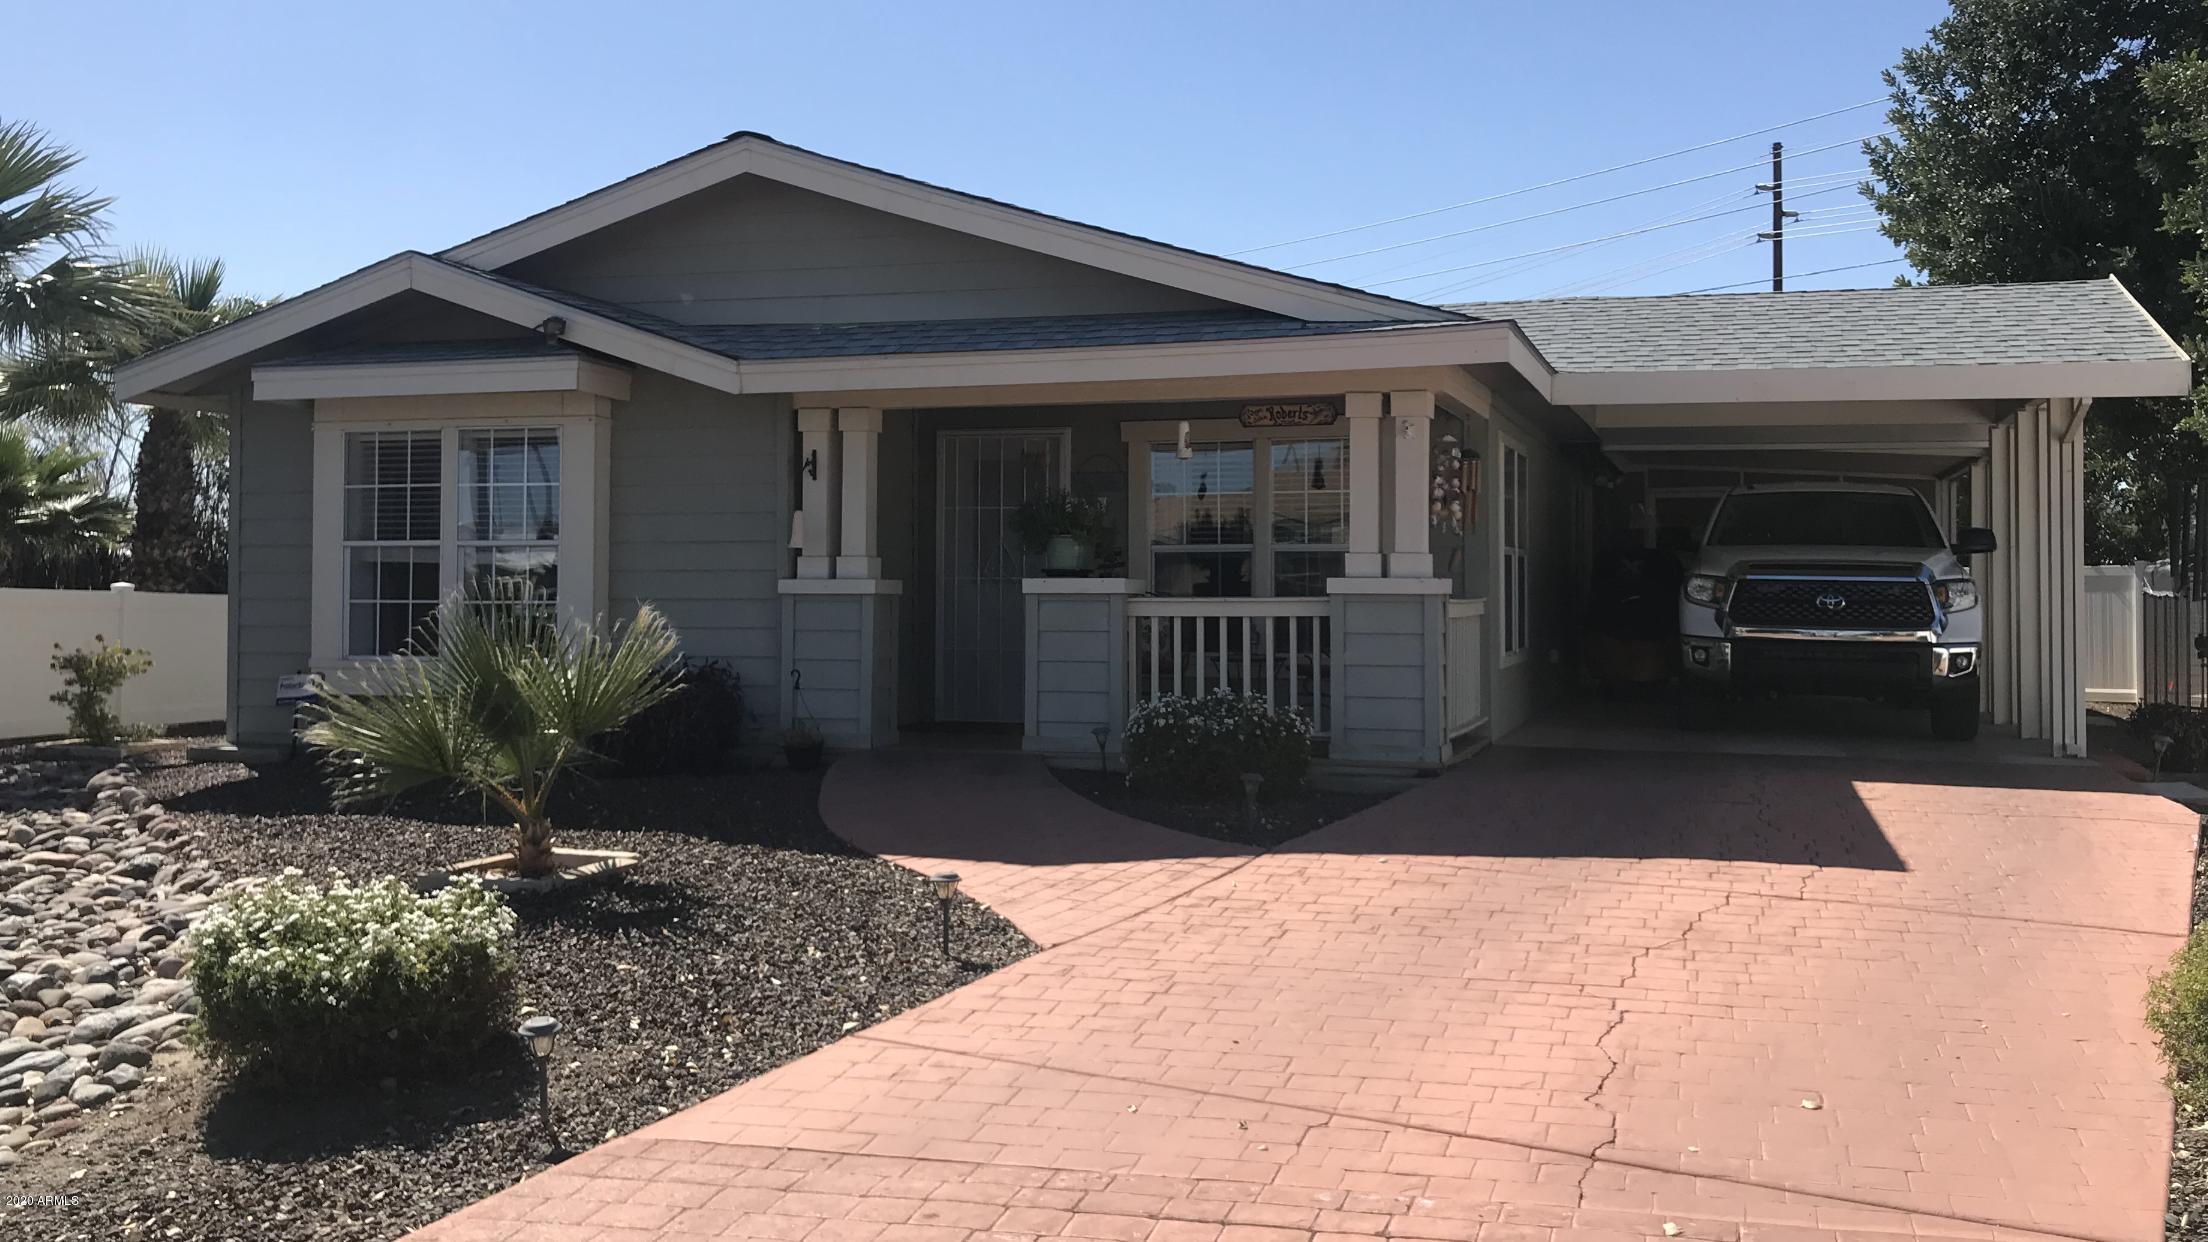 Photo of 11411 N 91ST Avenue #230, Peoria, AZ 85345